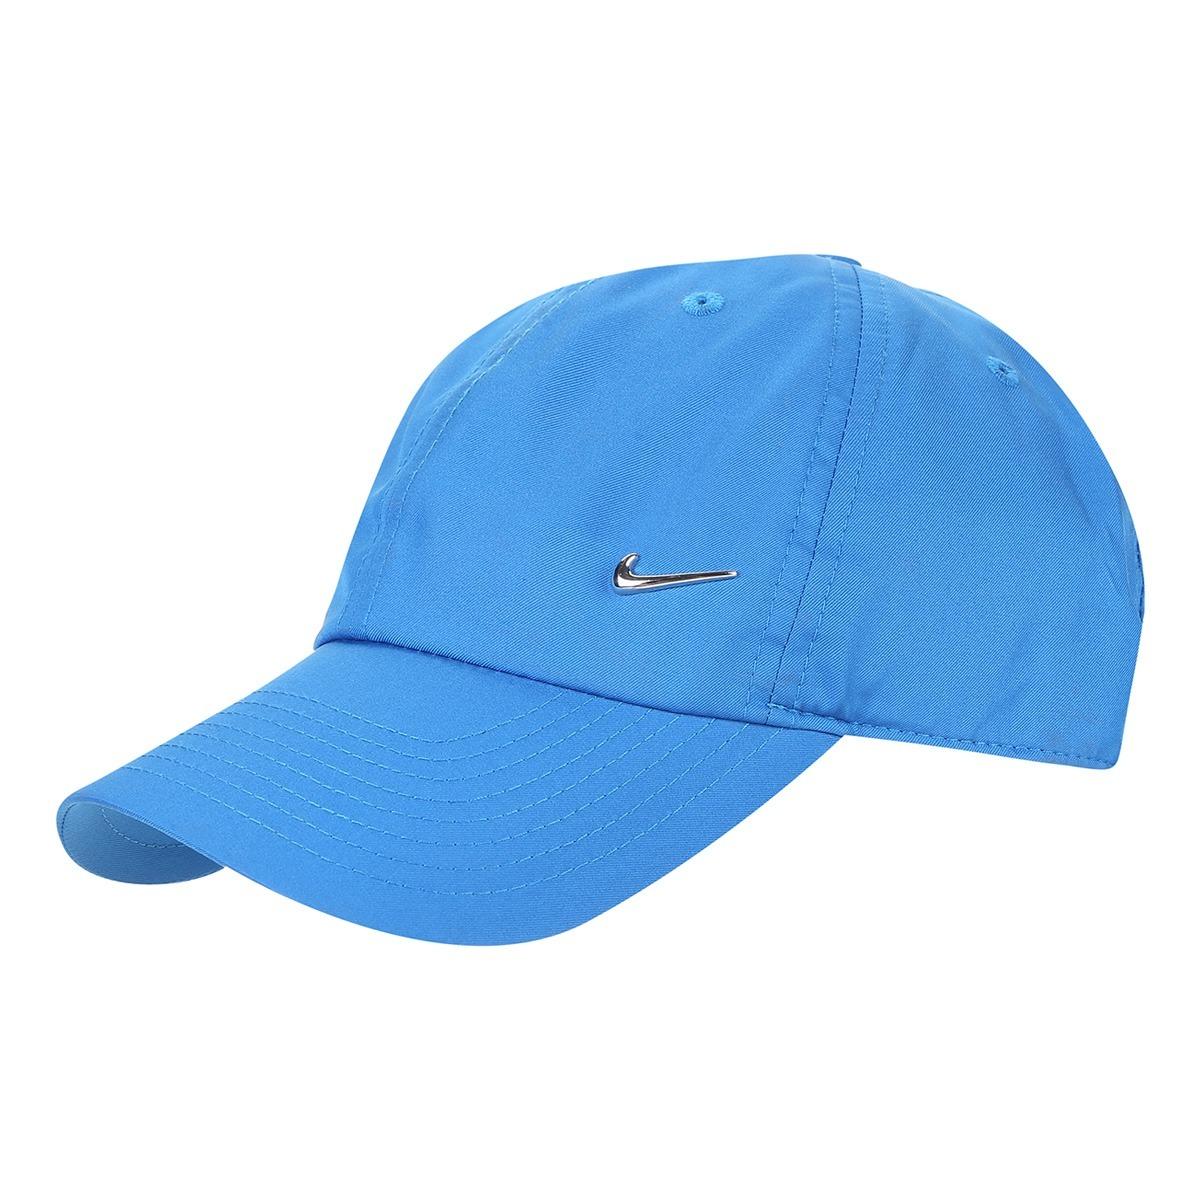 boné nike sportswear h86 metal swoosh (azul roya) -  corrida. Carregando  zoom. a0055bf606c